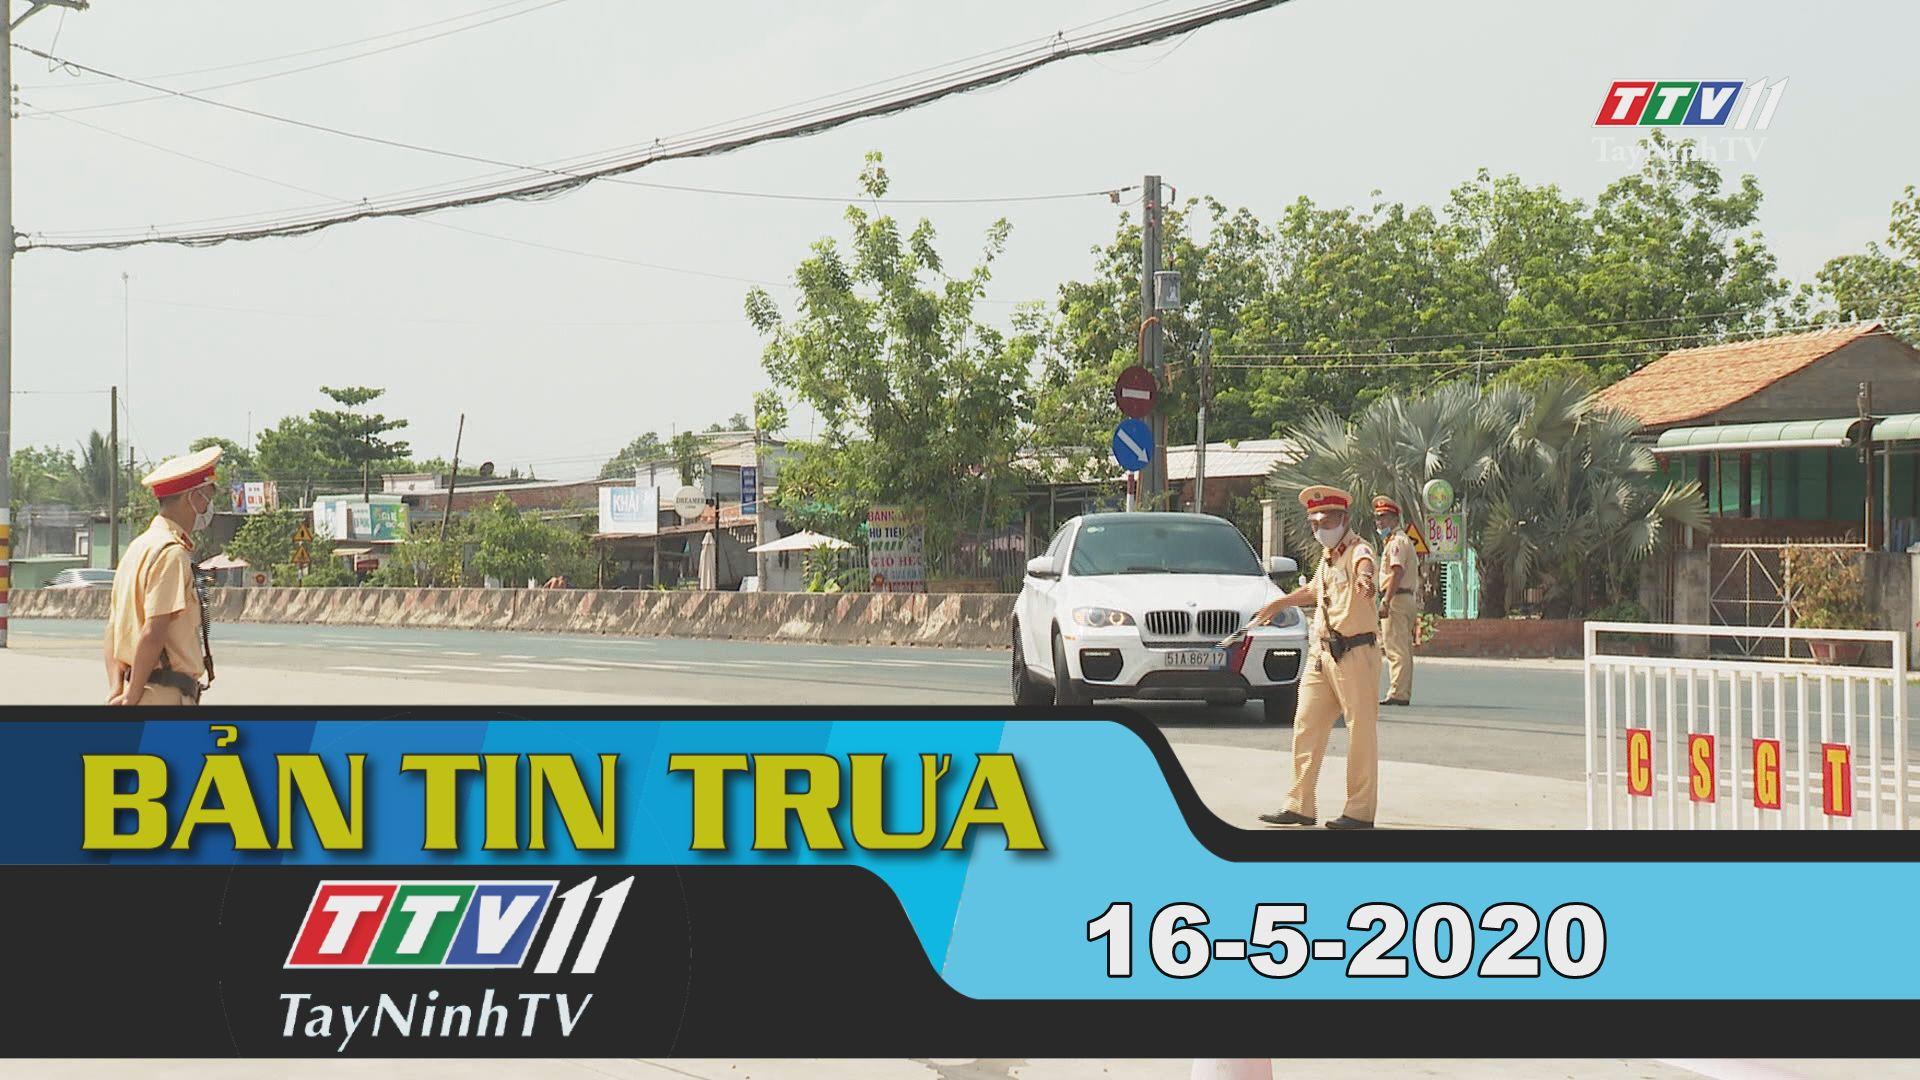 Bản tin trưa 16-5-2020 | Tin tức hôm nay | TayNinhTV